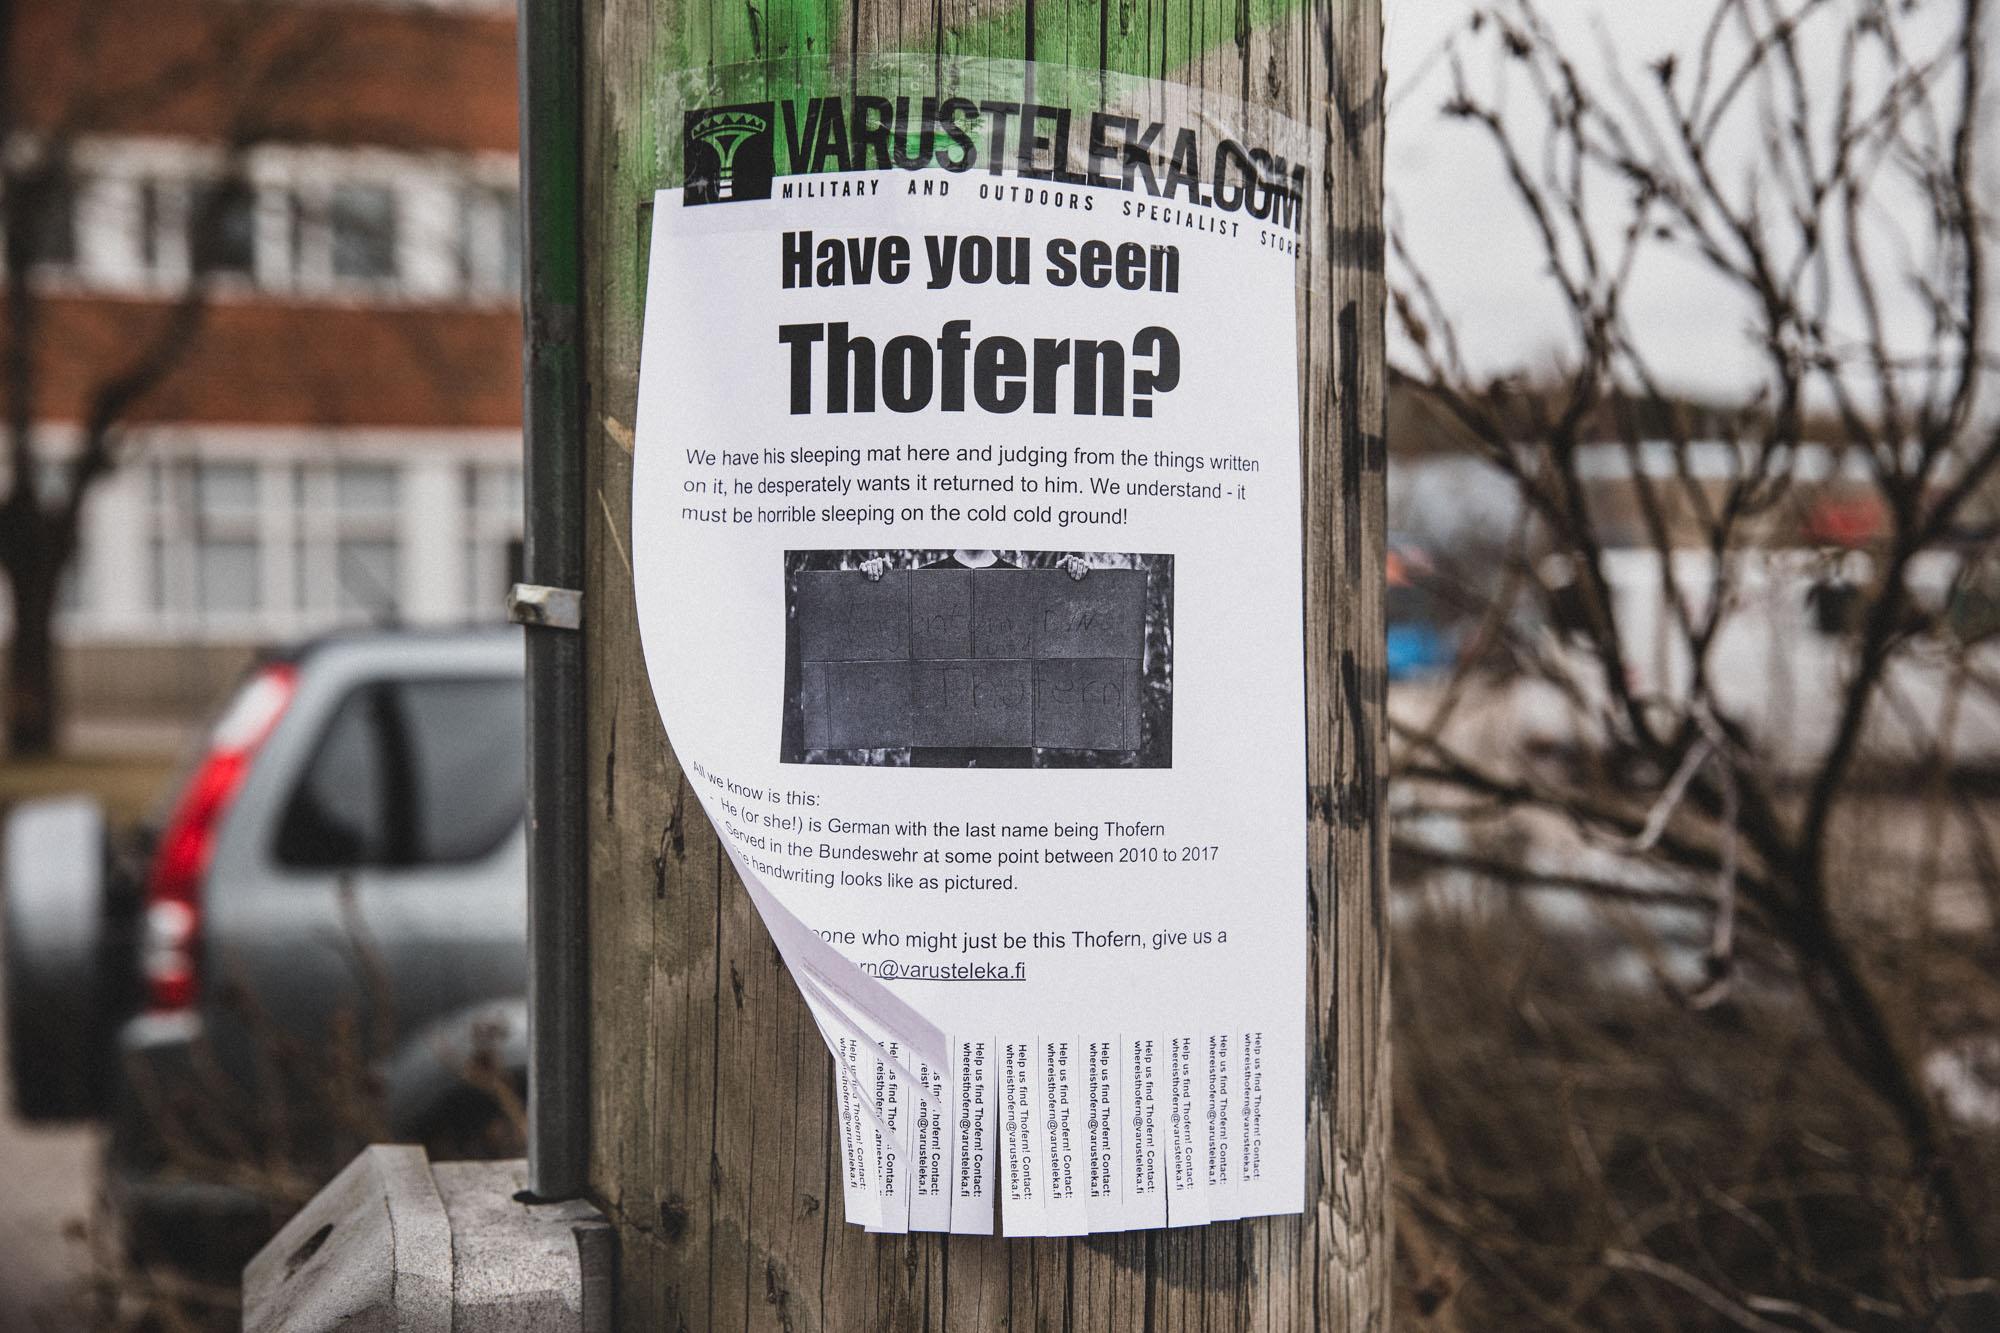 Where is Thofern?